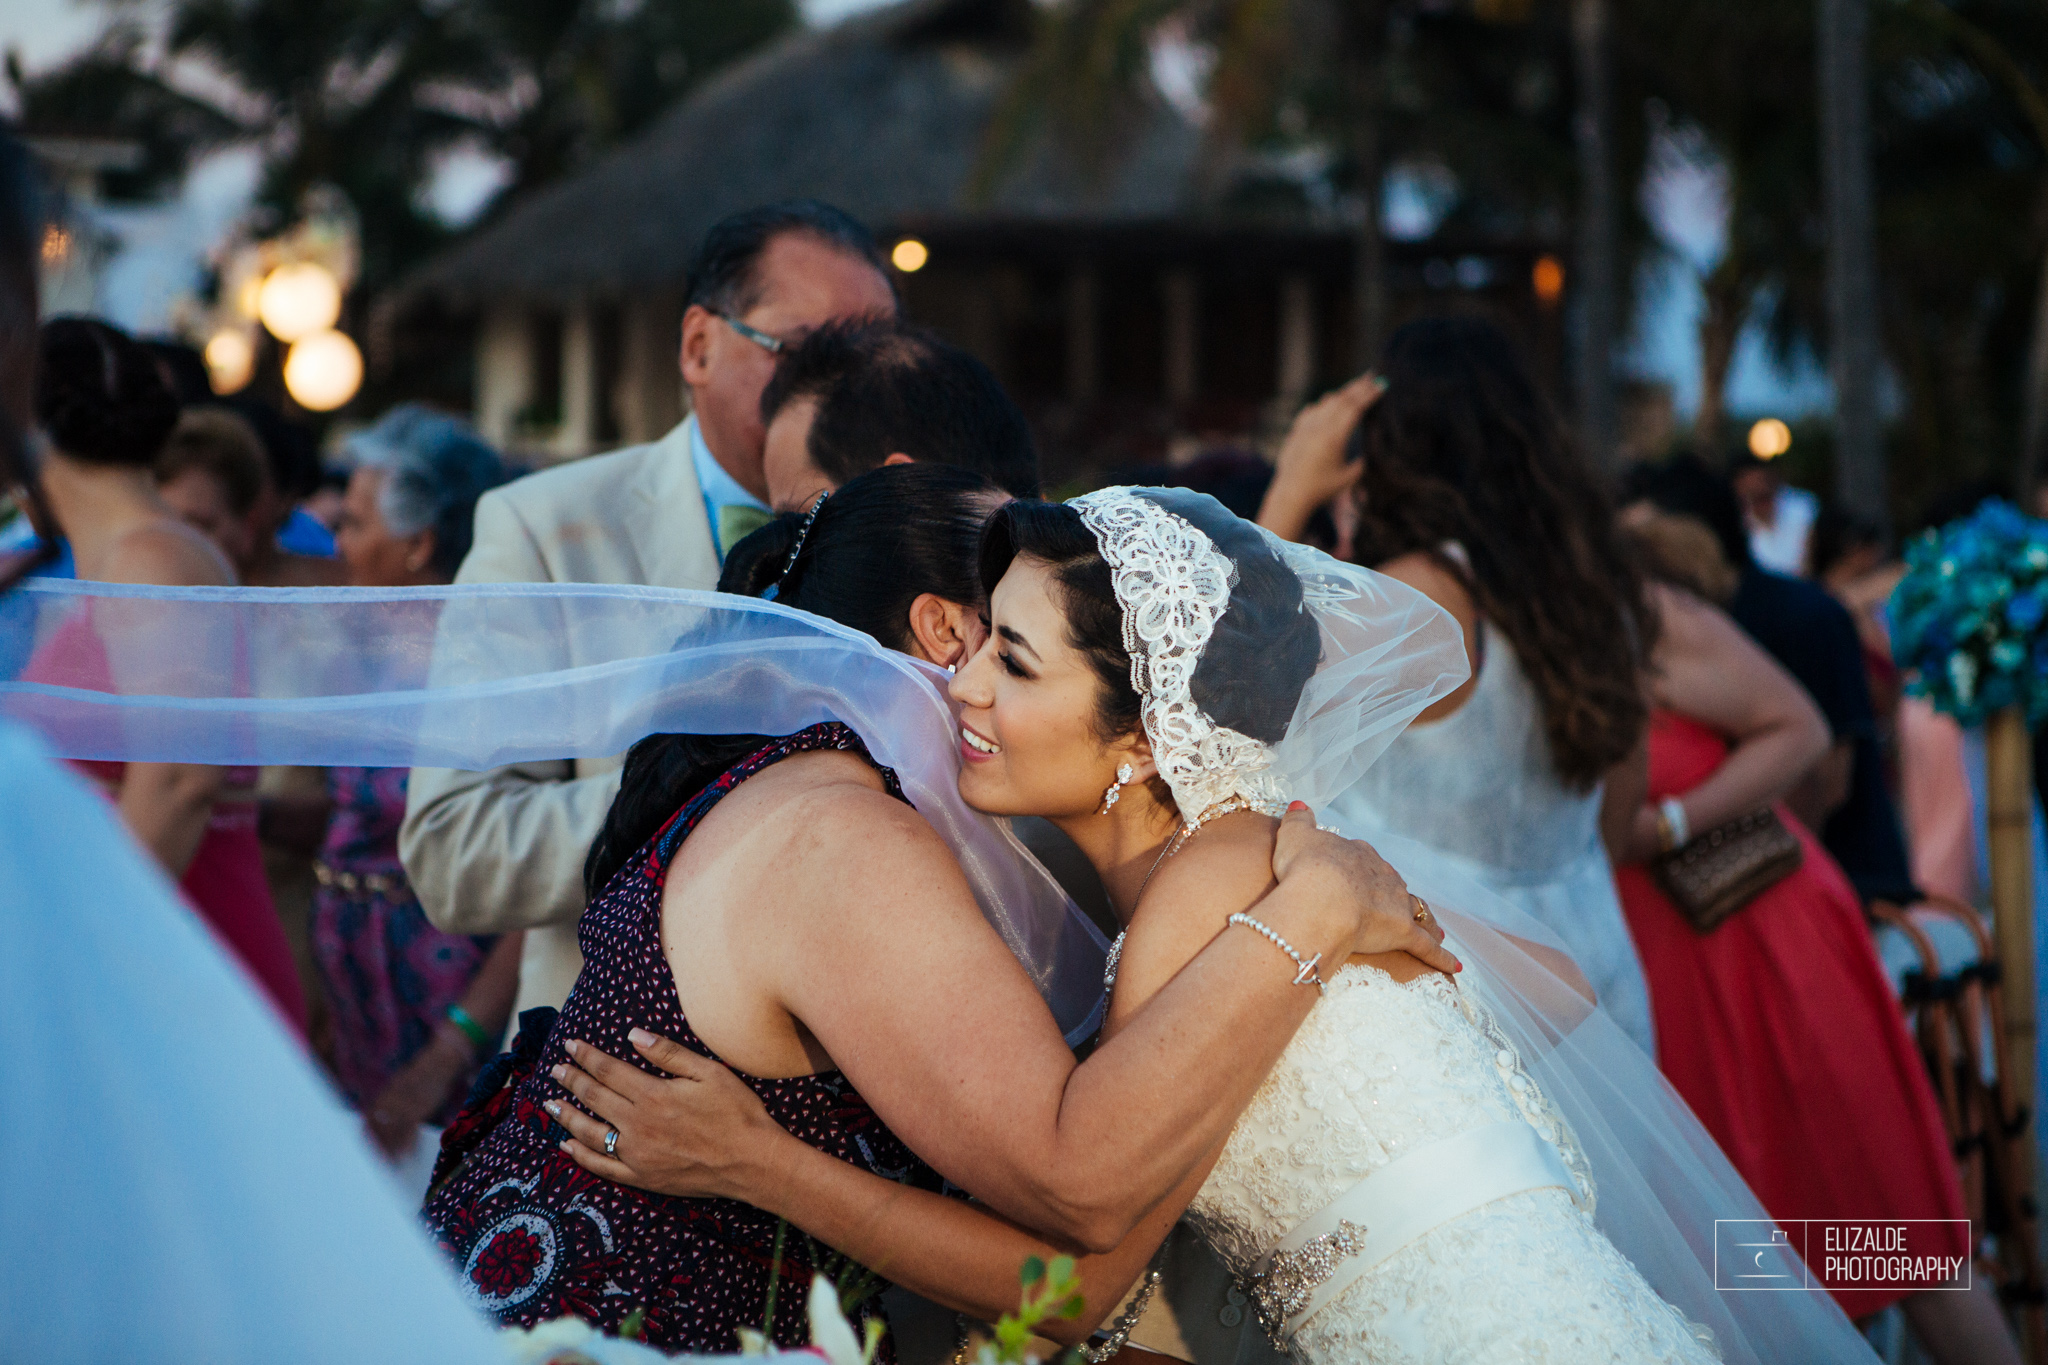 Pay and Ferran_Acapulco_Destination Wedding_Elizalde Photography-102.jpg